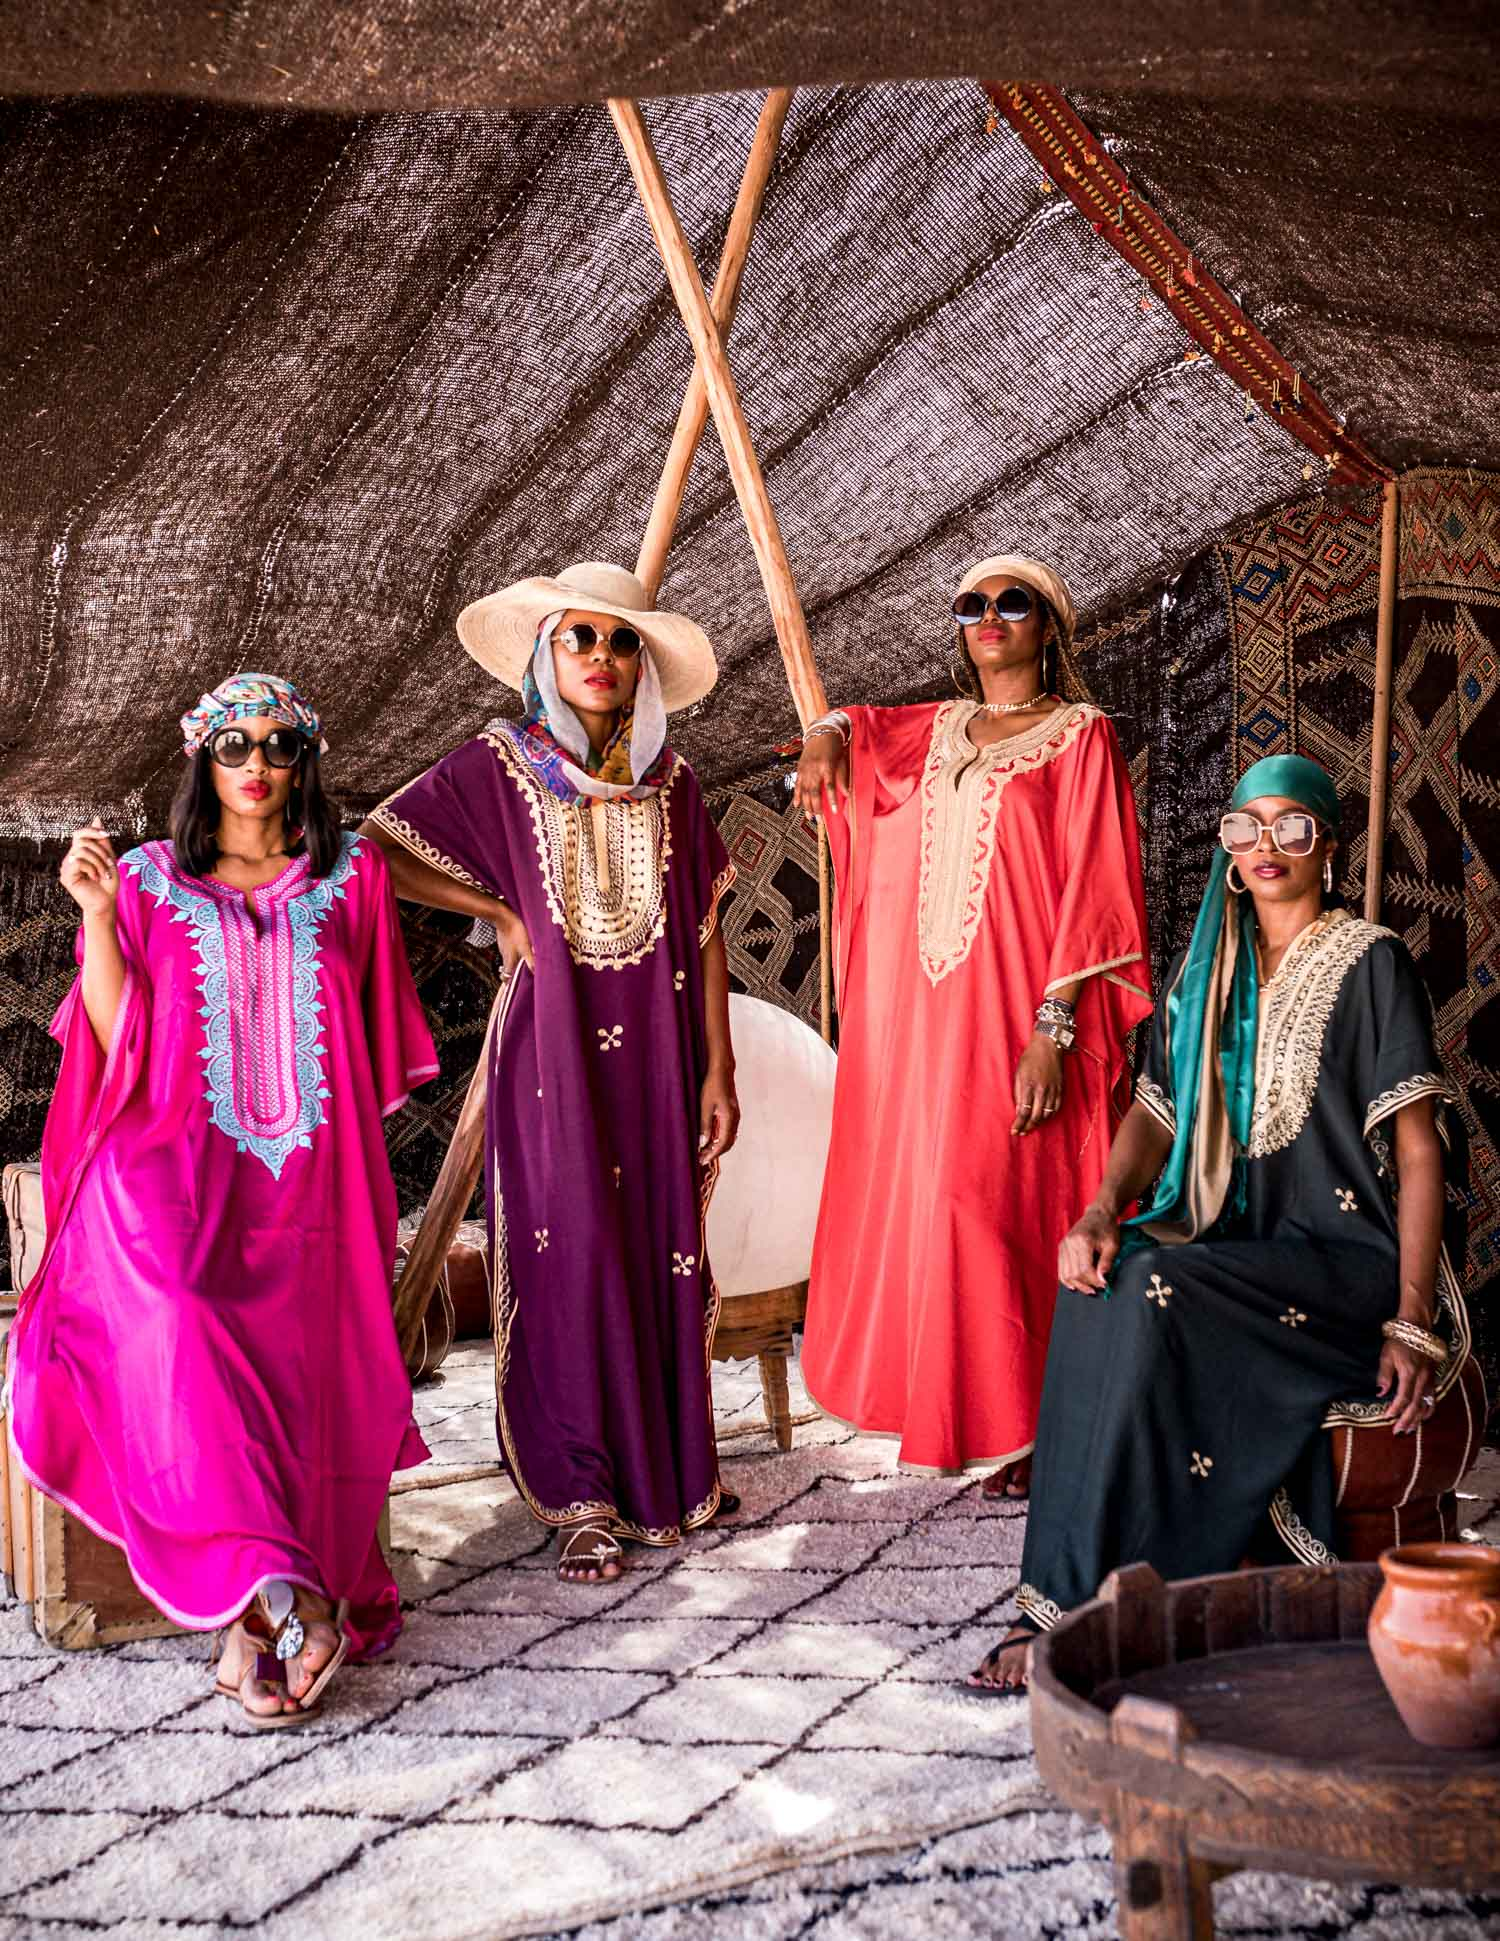 black bloggers wearing caftan in marrakech, vlog, travel blog, morocco